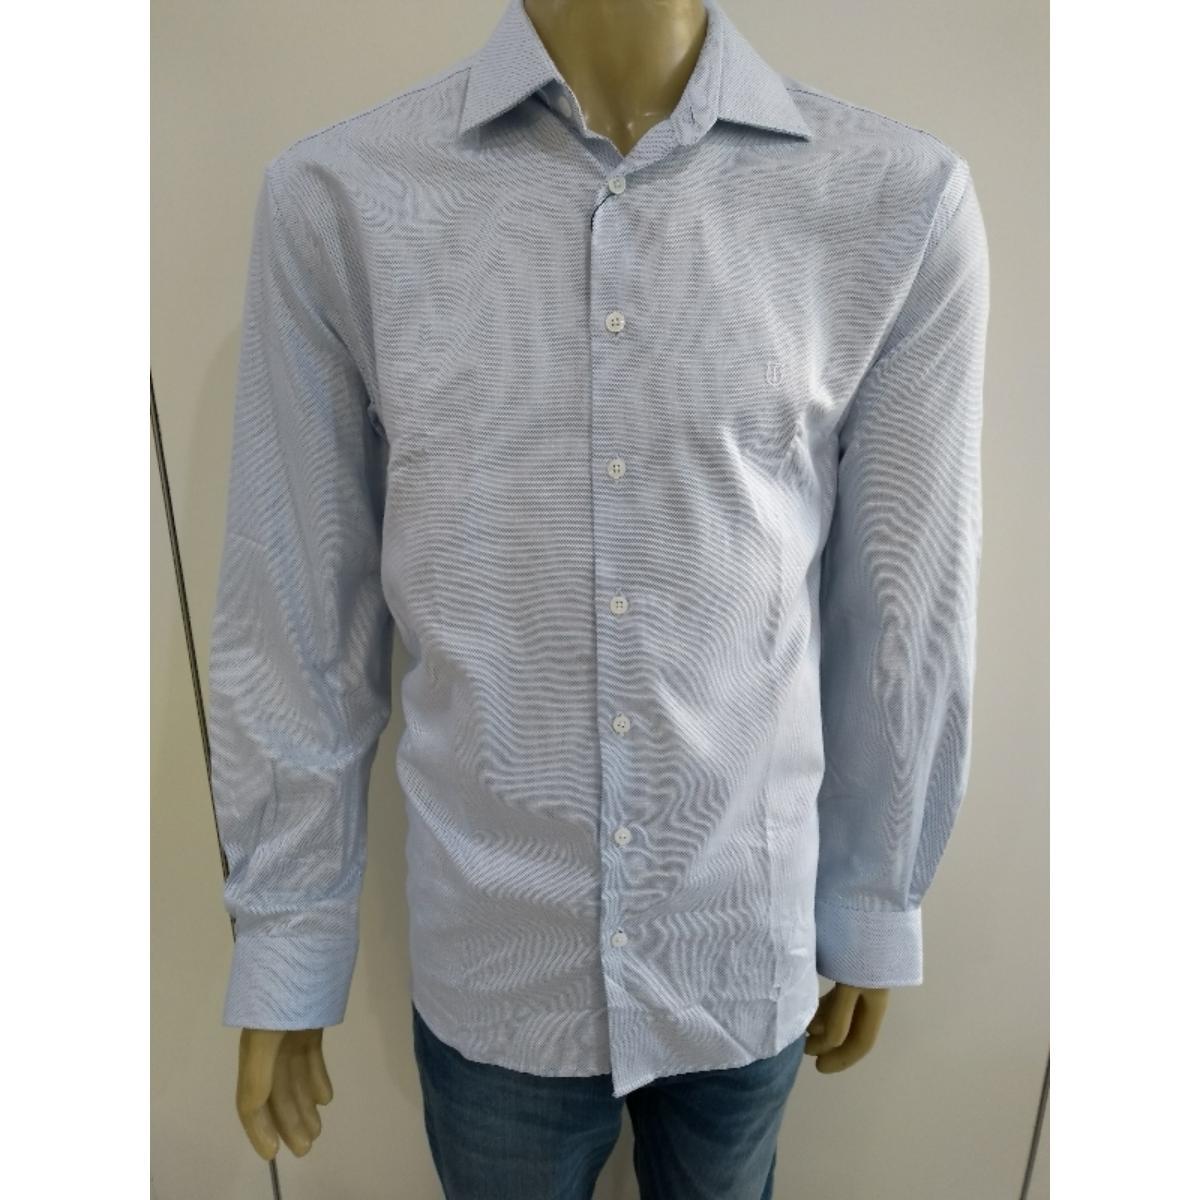 Camisa Masculina Individual 53.03.1075.02 Azul/branco